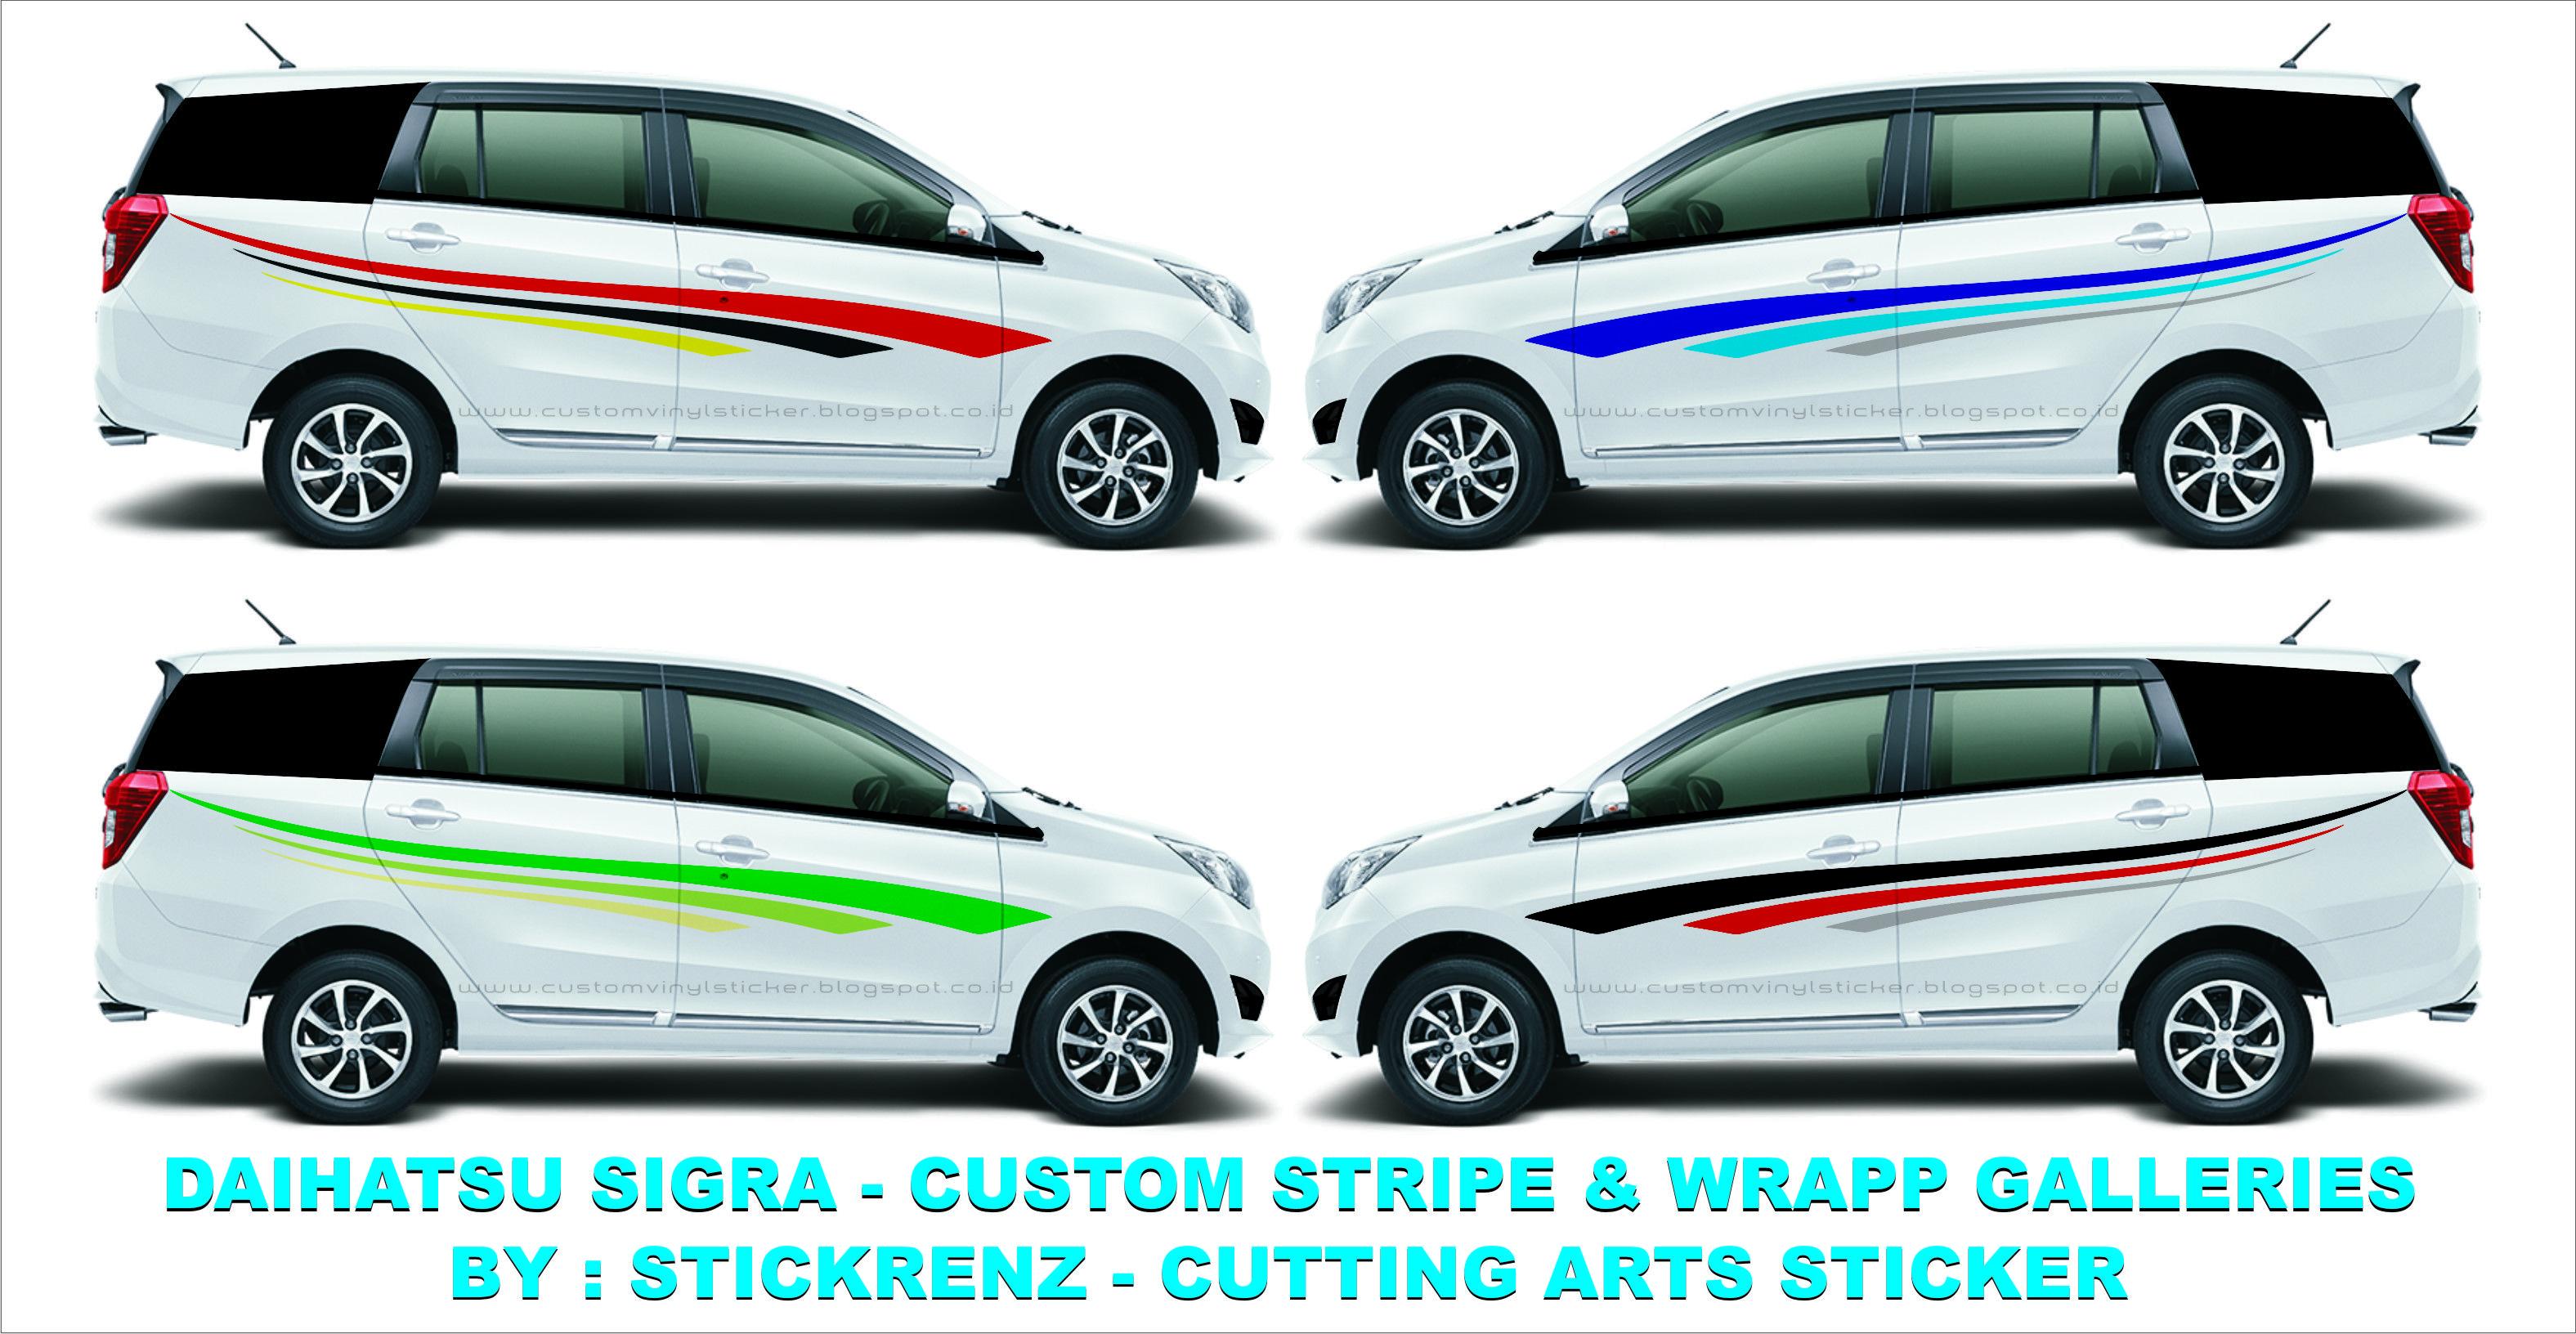 Daihatsu Sigra Custom Stripe Wrapp Concept Galleries 005